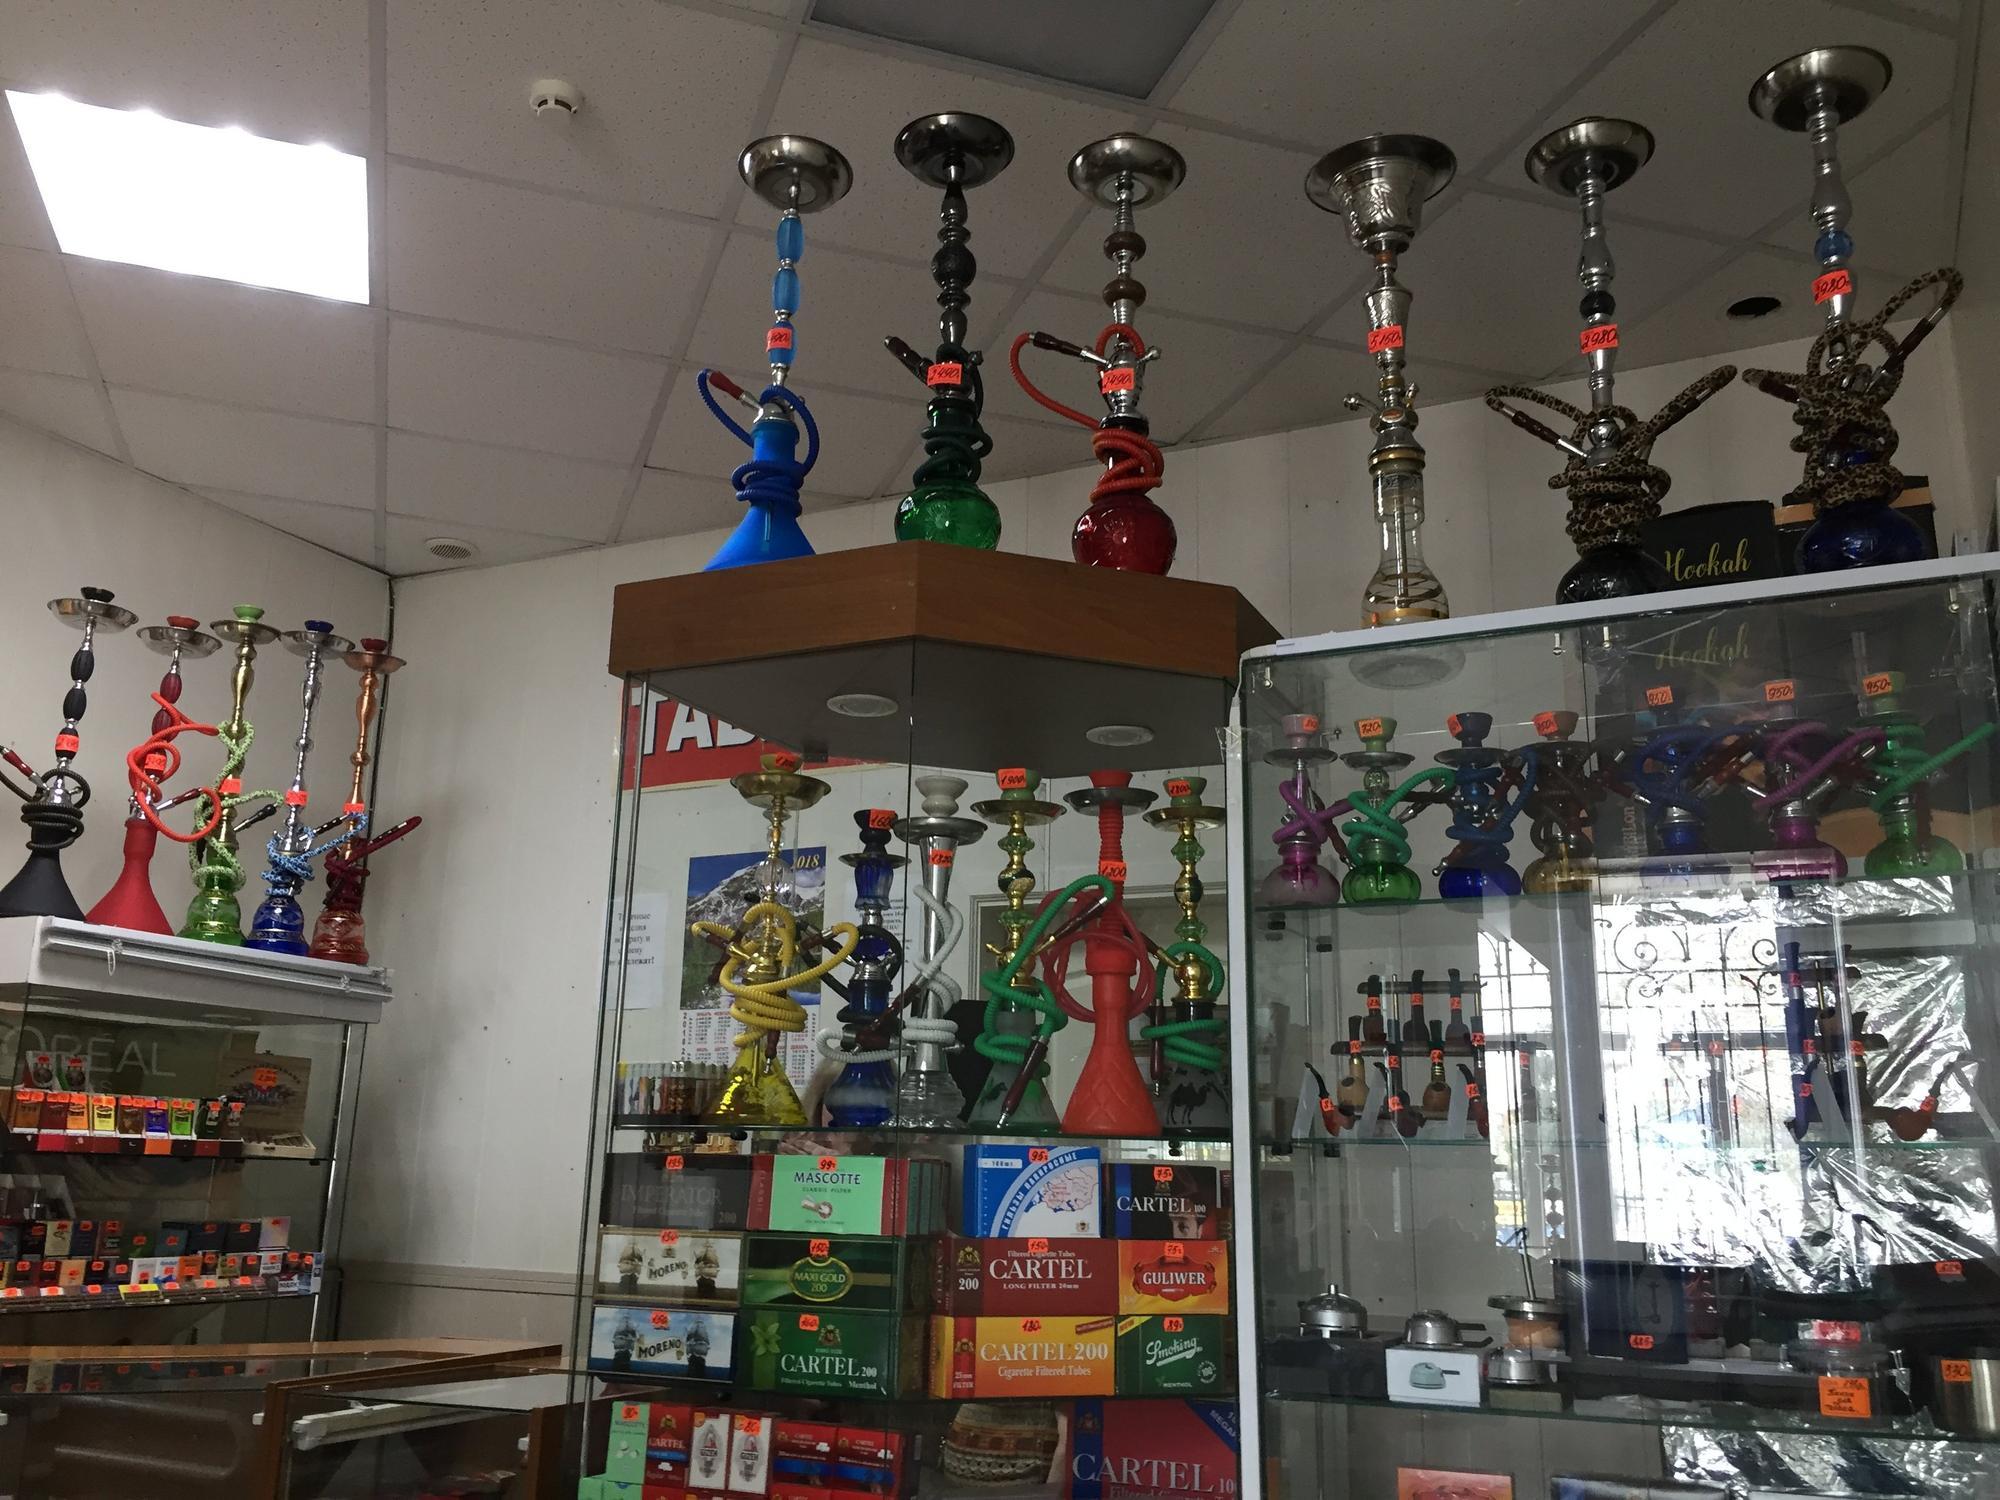 Sherlock магазин табачных изделий оптовая база сигарет табак